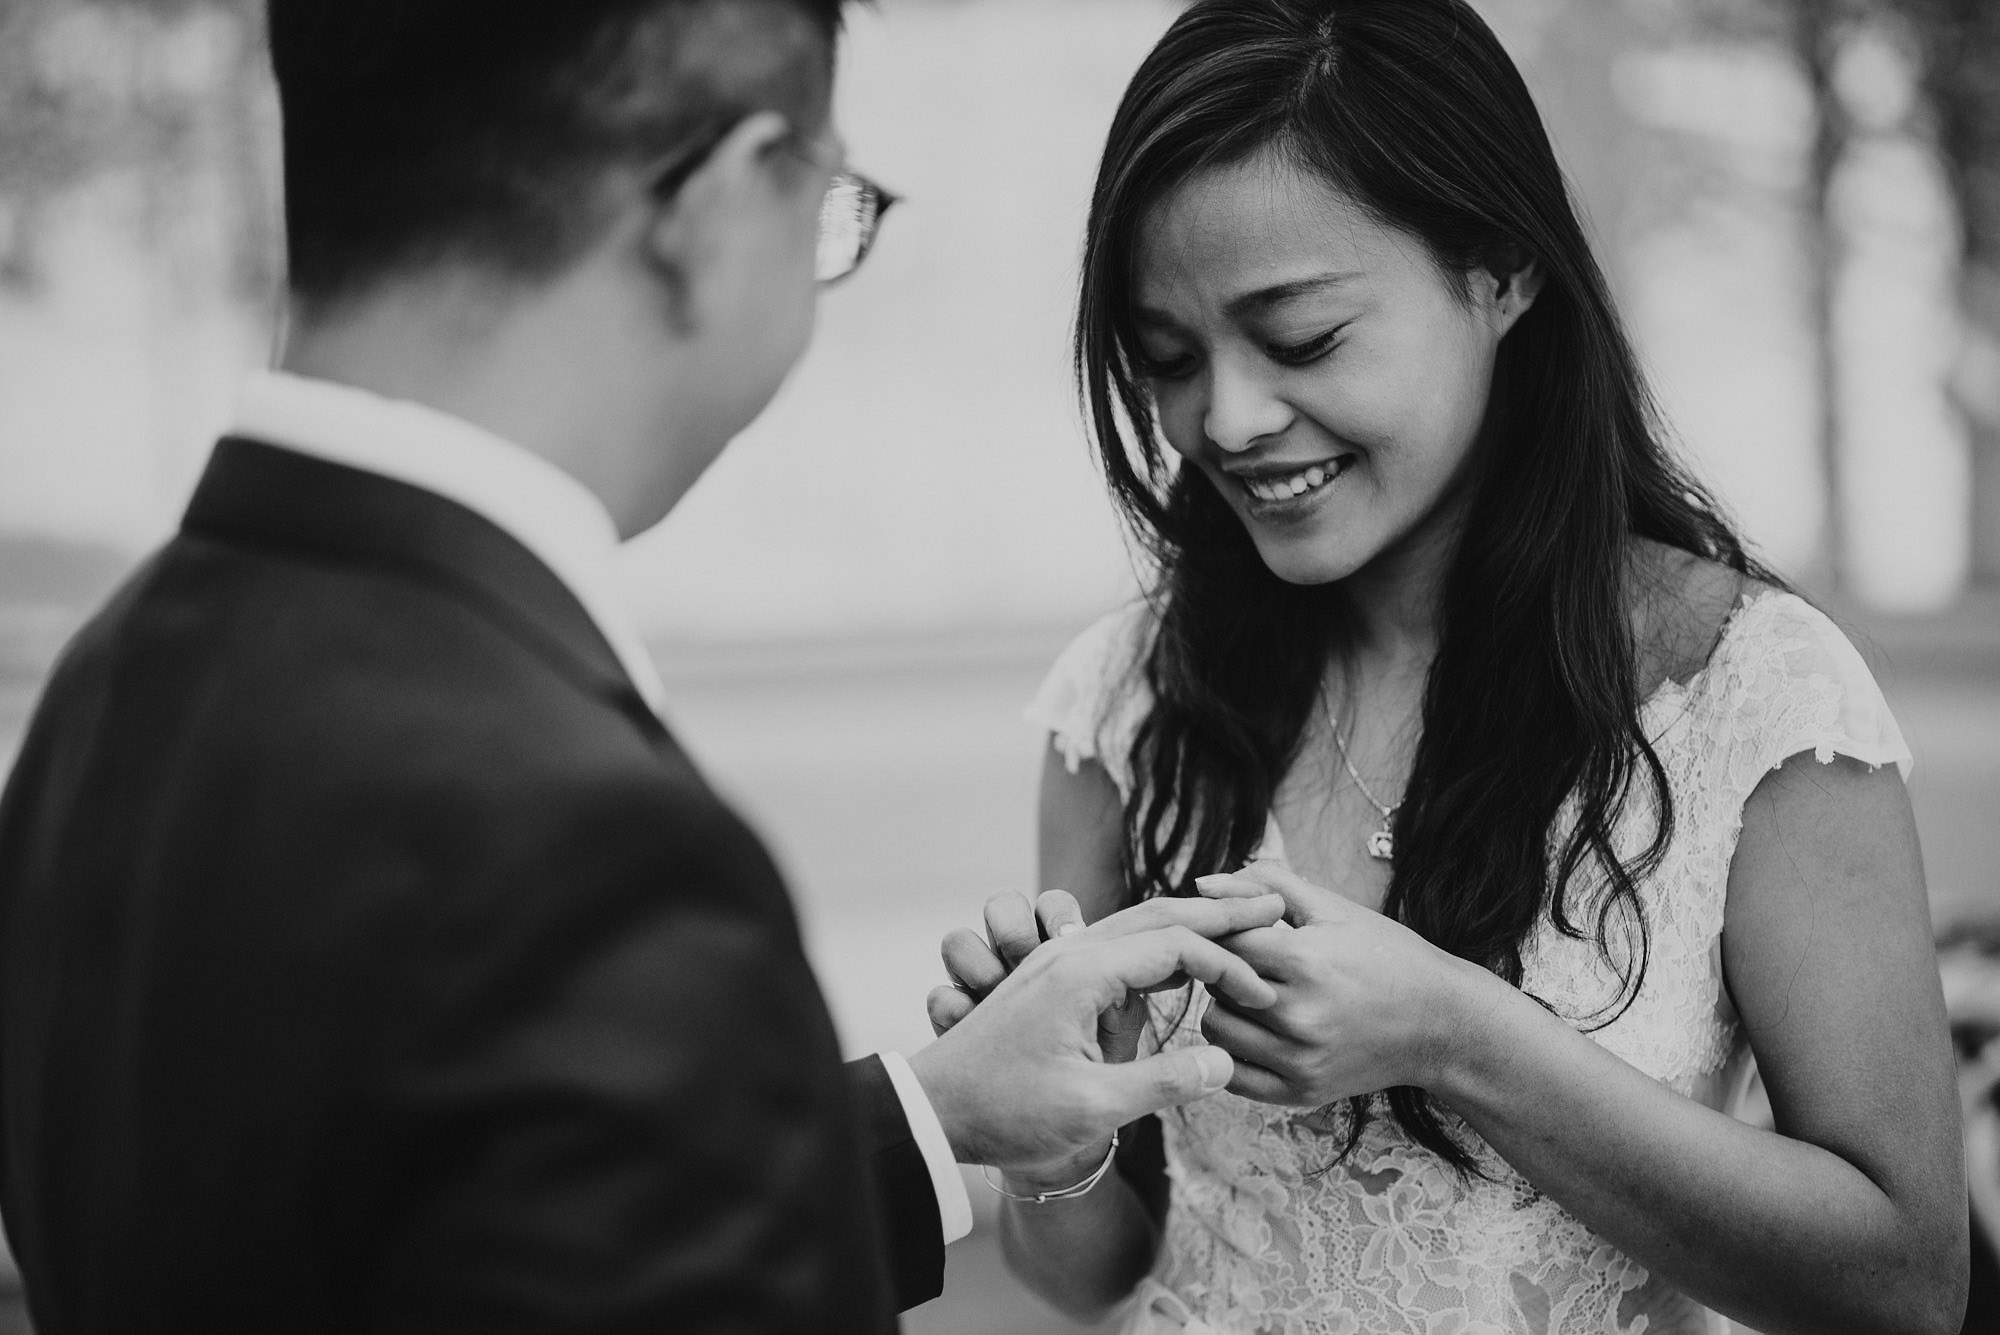 levi-ice-chapel-weddings-lapland-finland-photographer-jere-satamo-016-blog.jpg